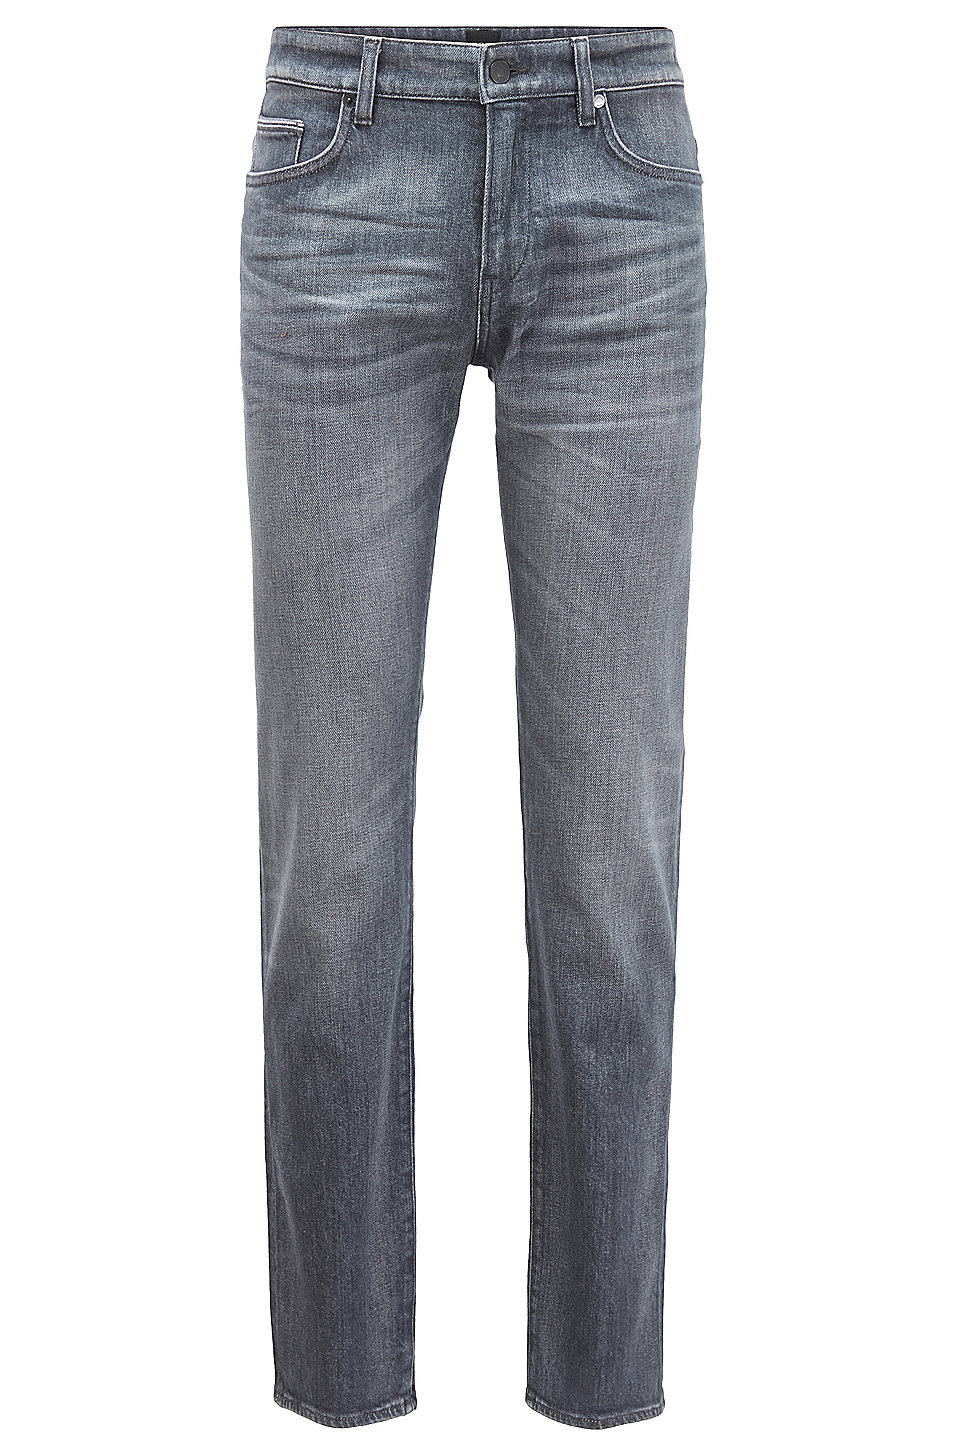 BOSS - Slim-fit jeans in grey comfort-stretch denim